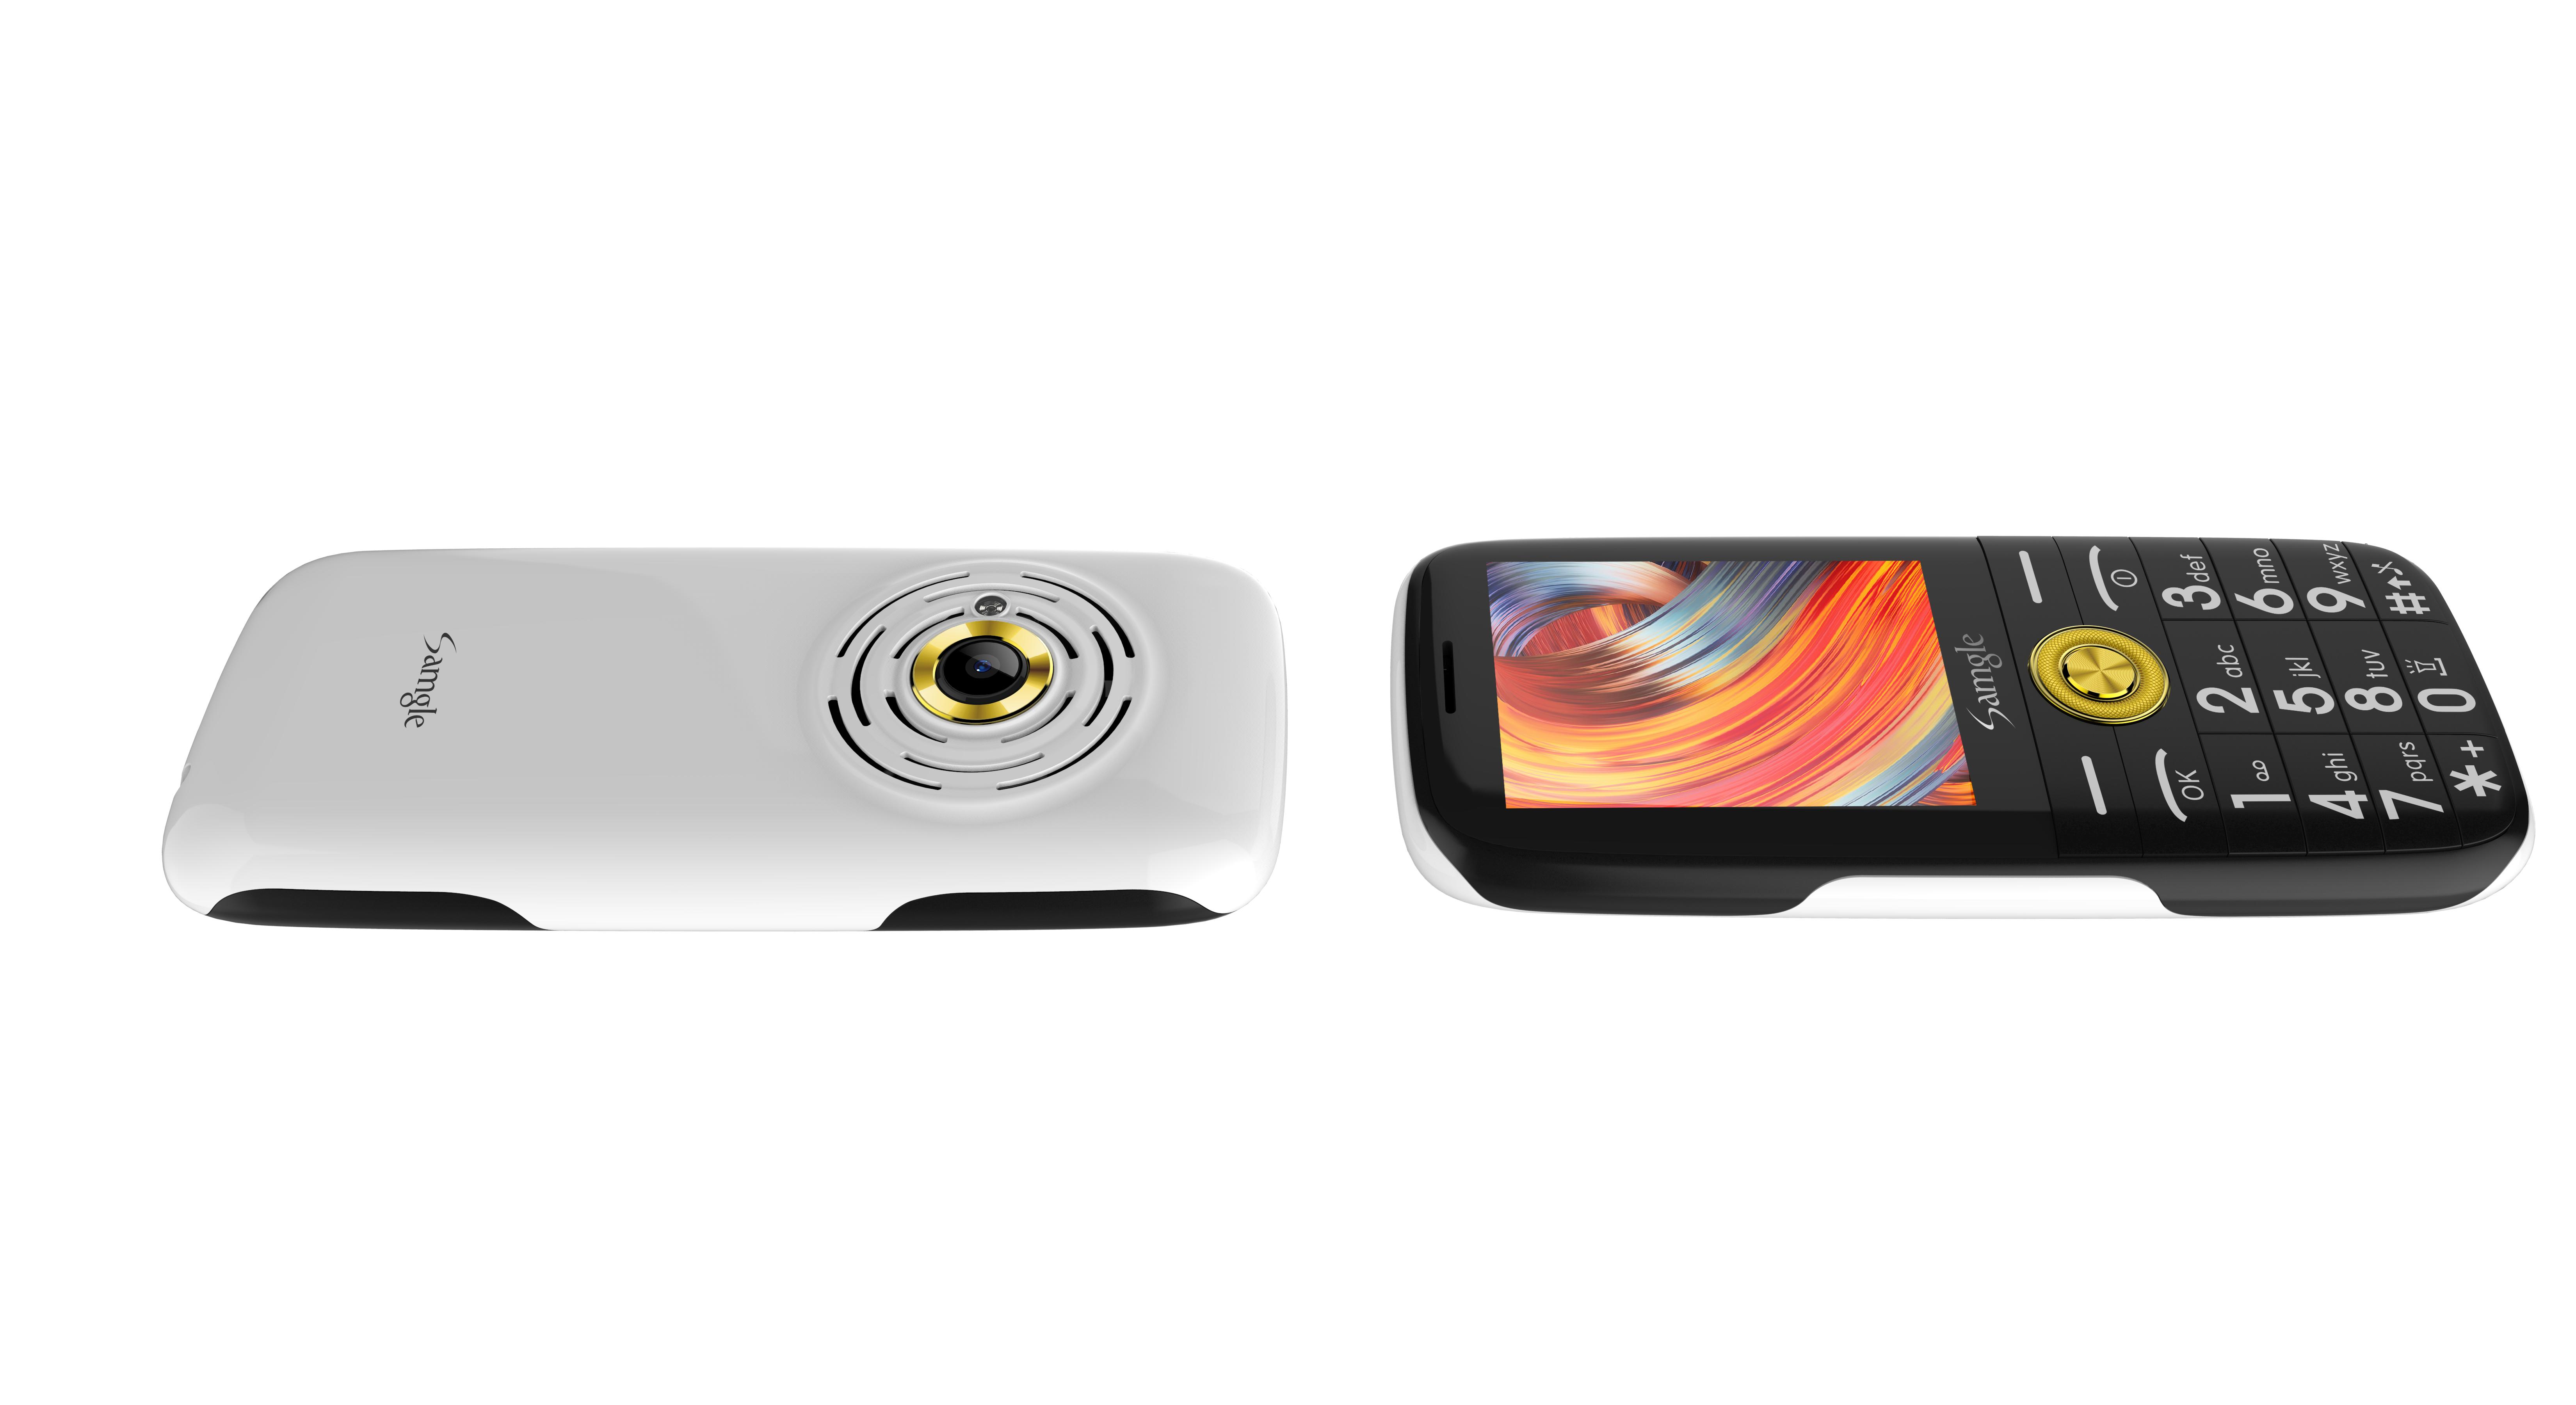 Telefon mobil Samgle Captain 3G, QVGA 2.4 inch, Bluetooth, Digi 3G, Camera, Slot Card, Radio FM, Internet, Dual SIM 11